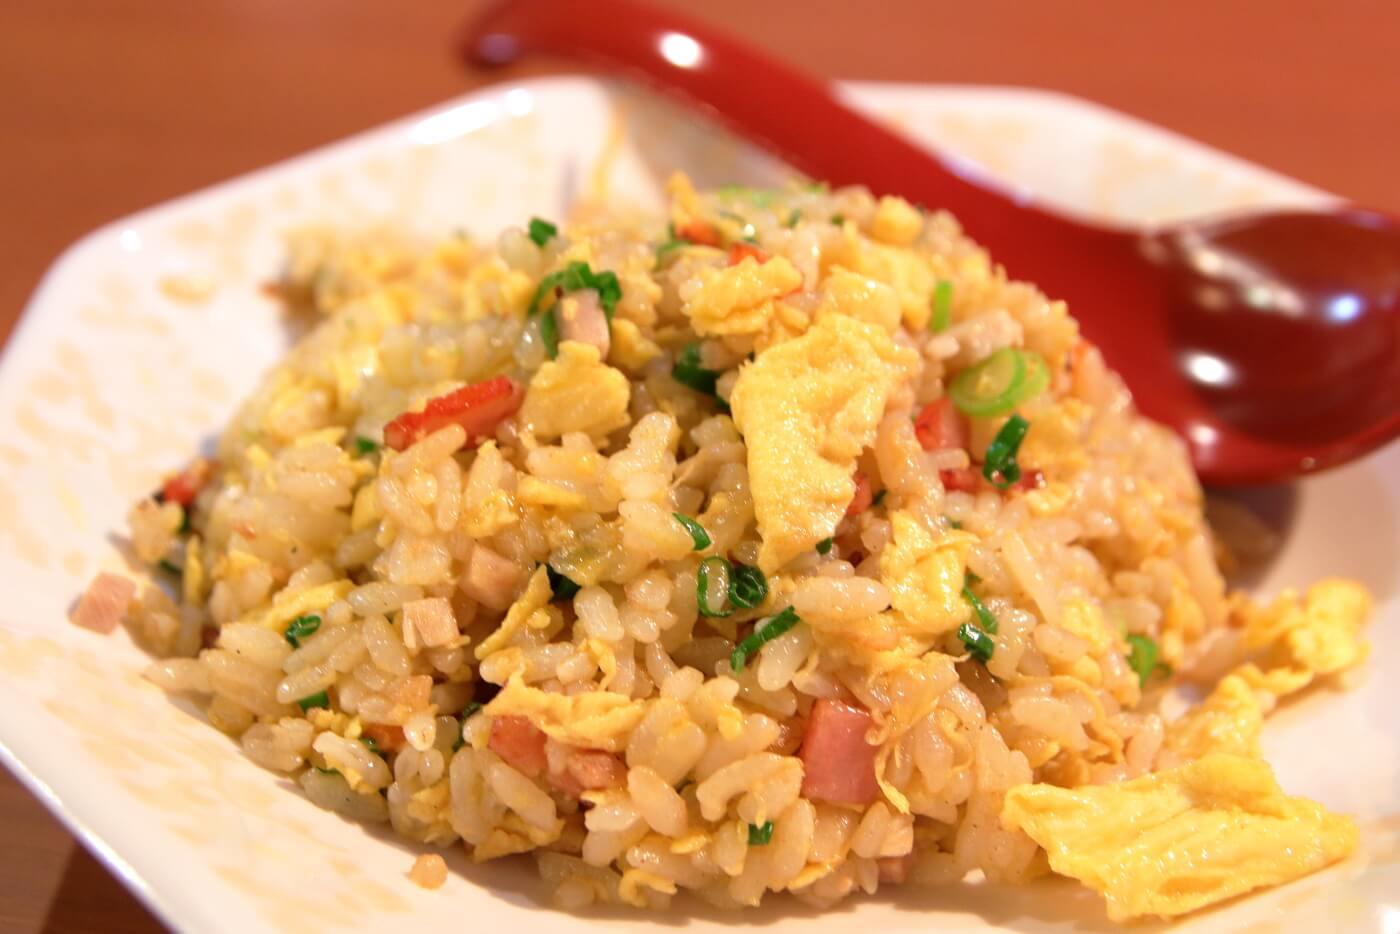 製麺処蔵木南国店 焼飯の小